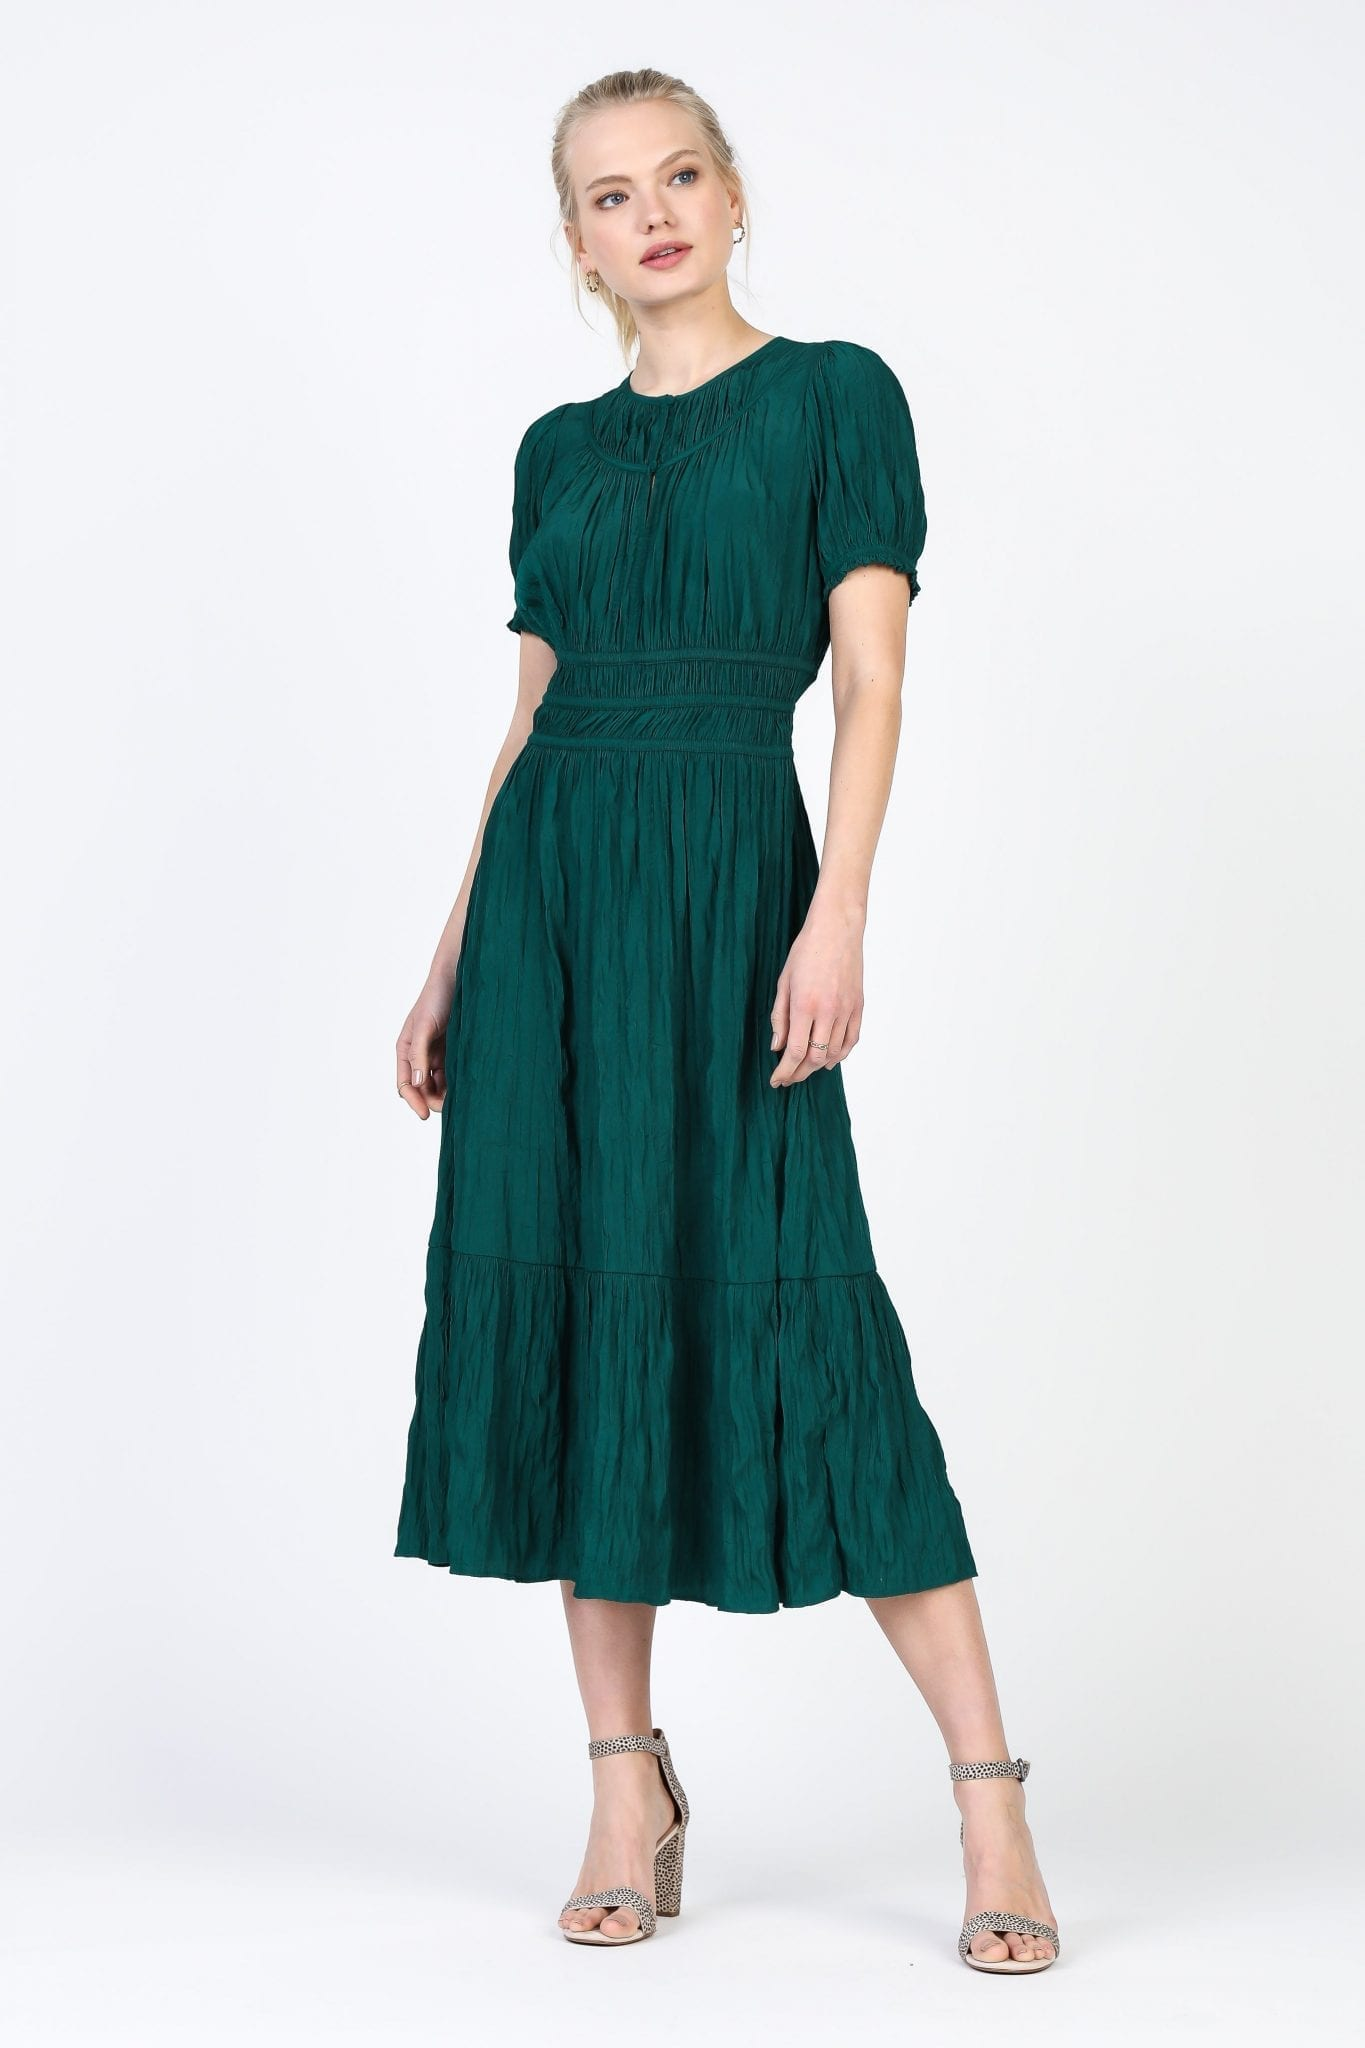 SHOPCURRENTAIR Brooklyn Midi Dress